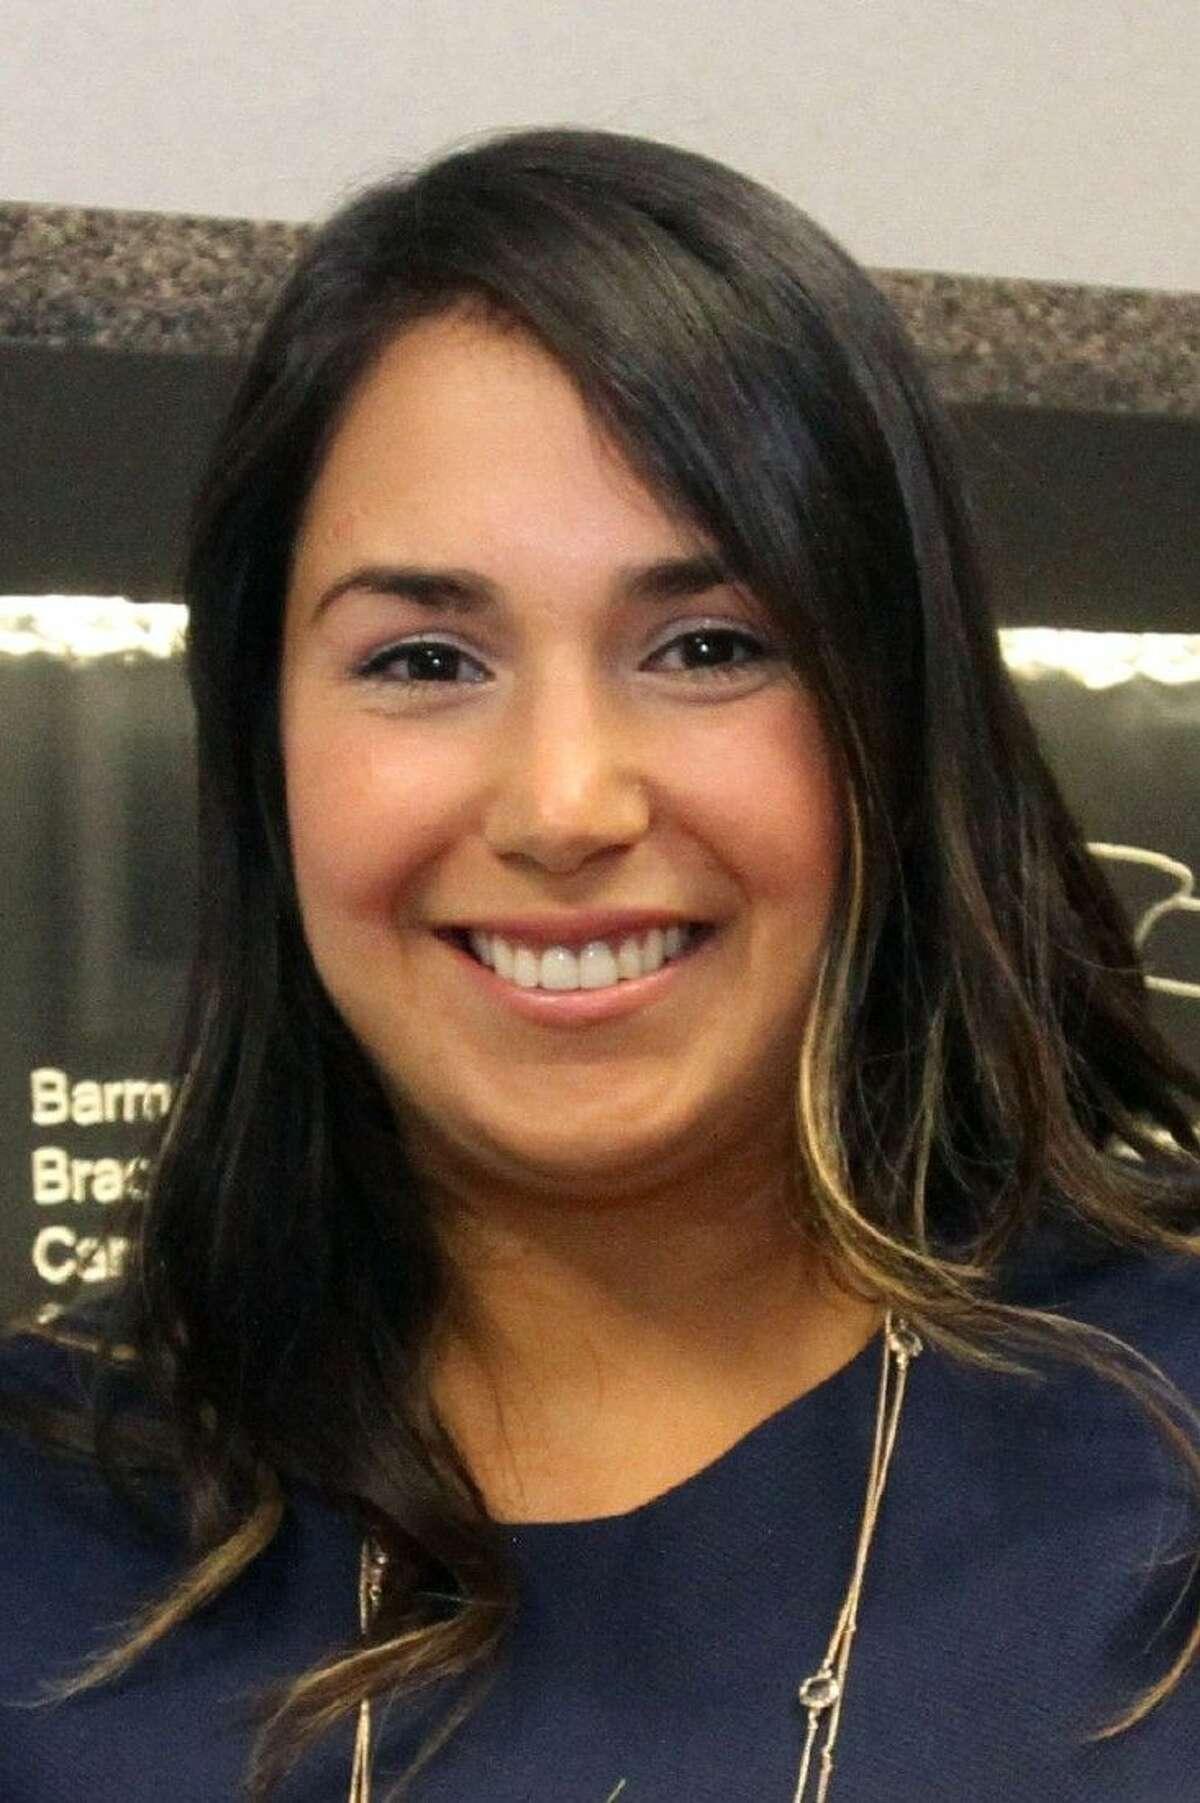 Adriana Saavedra-Palomares